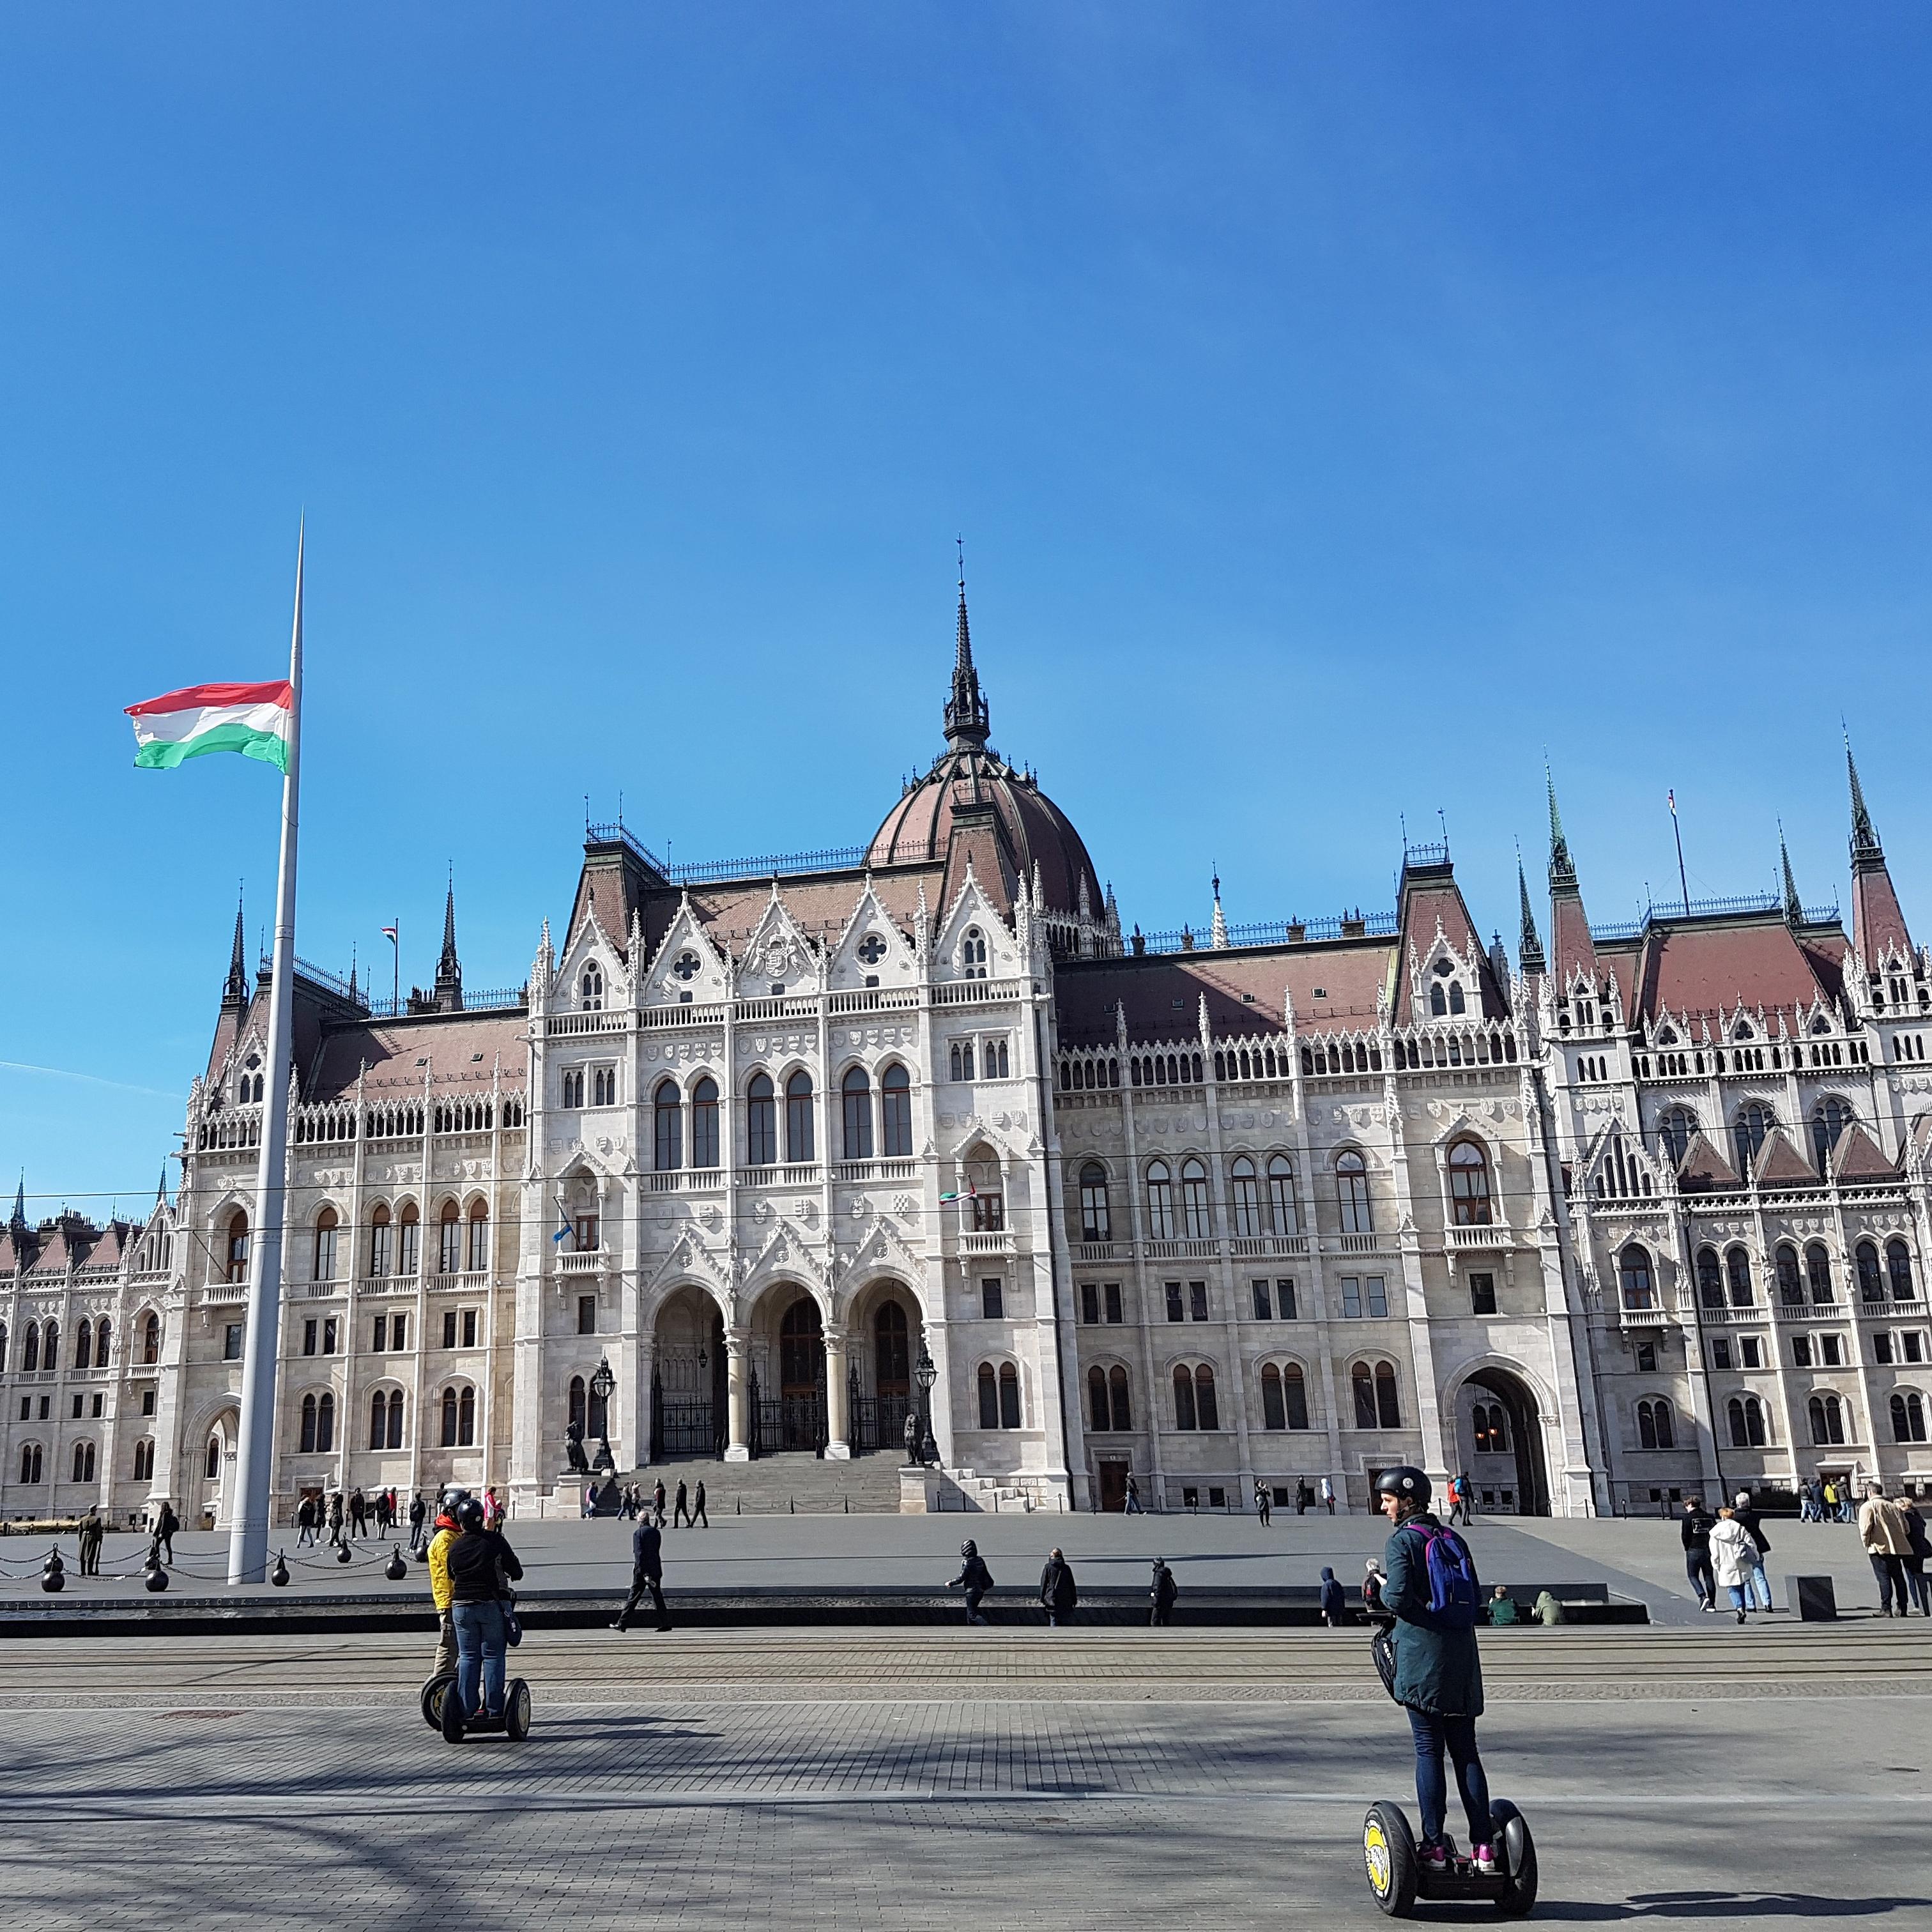 12. Parliament